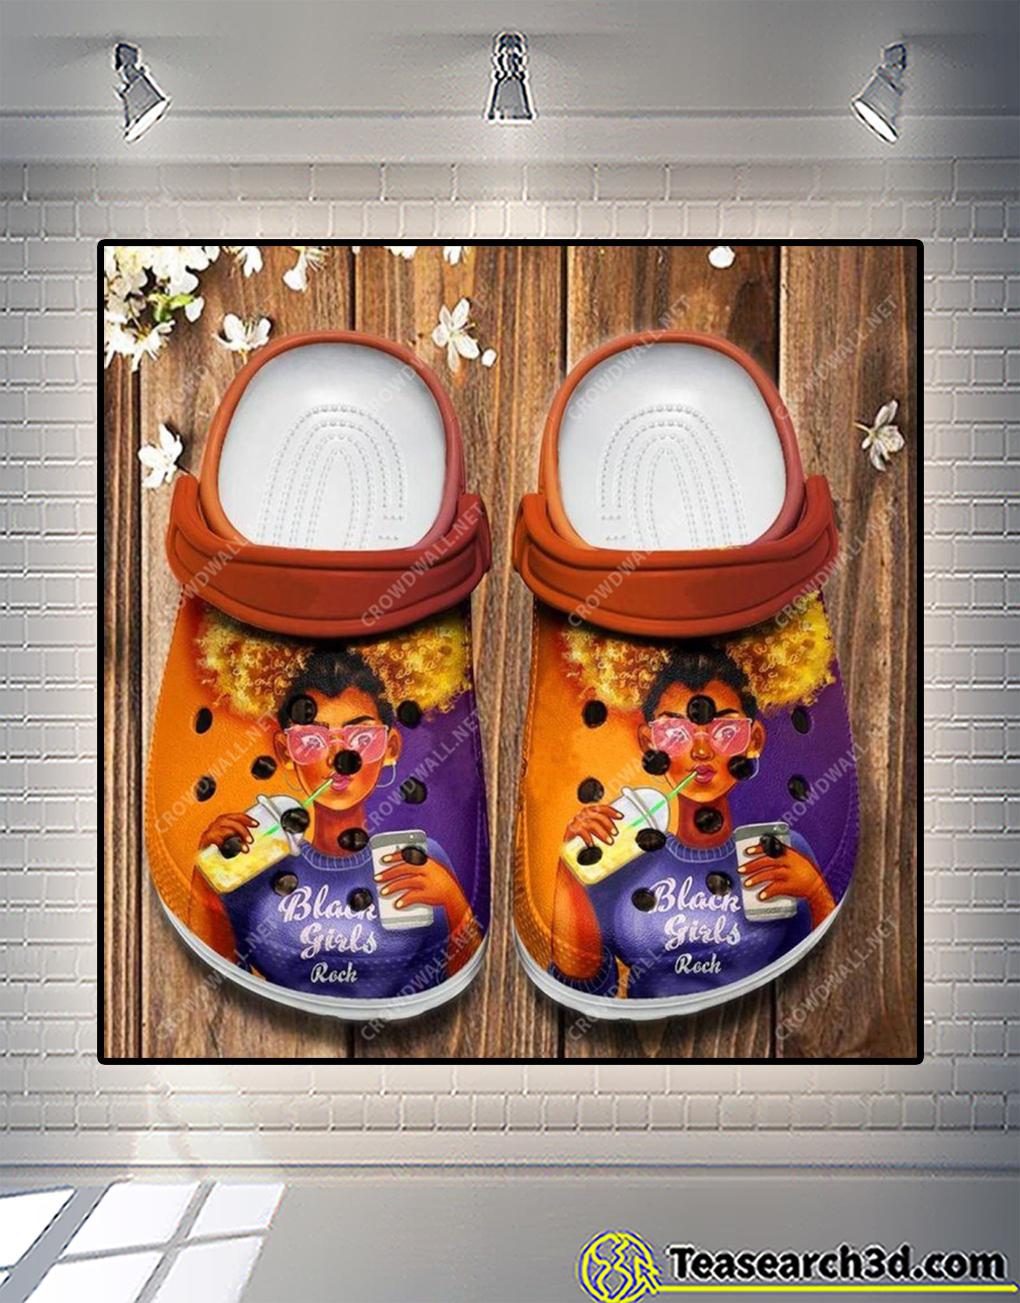 Afro black girls rock crocs shoes